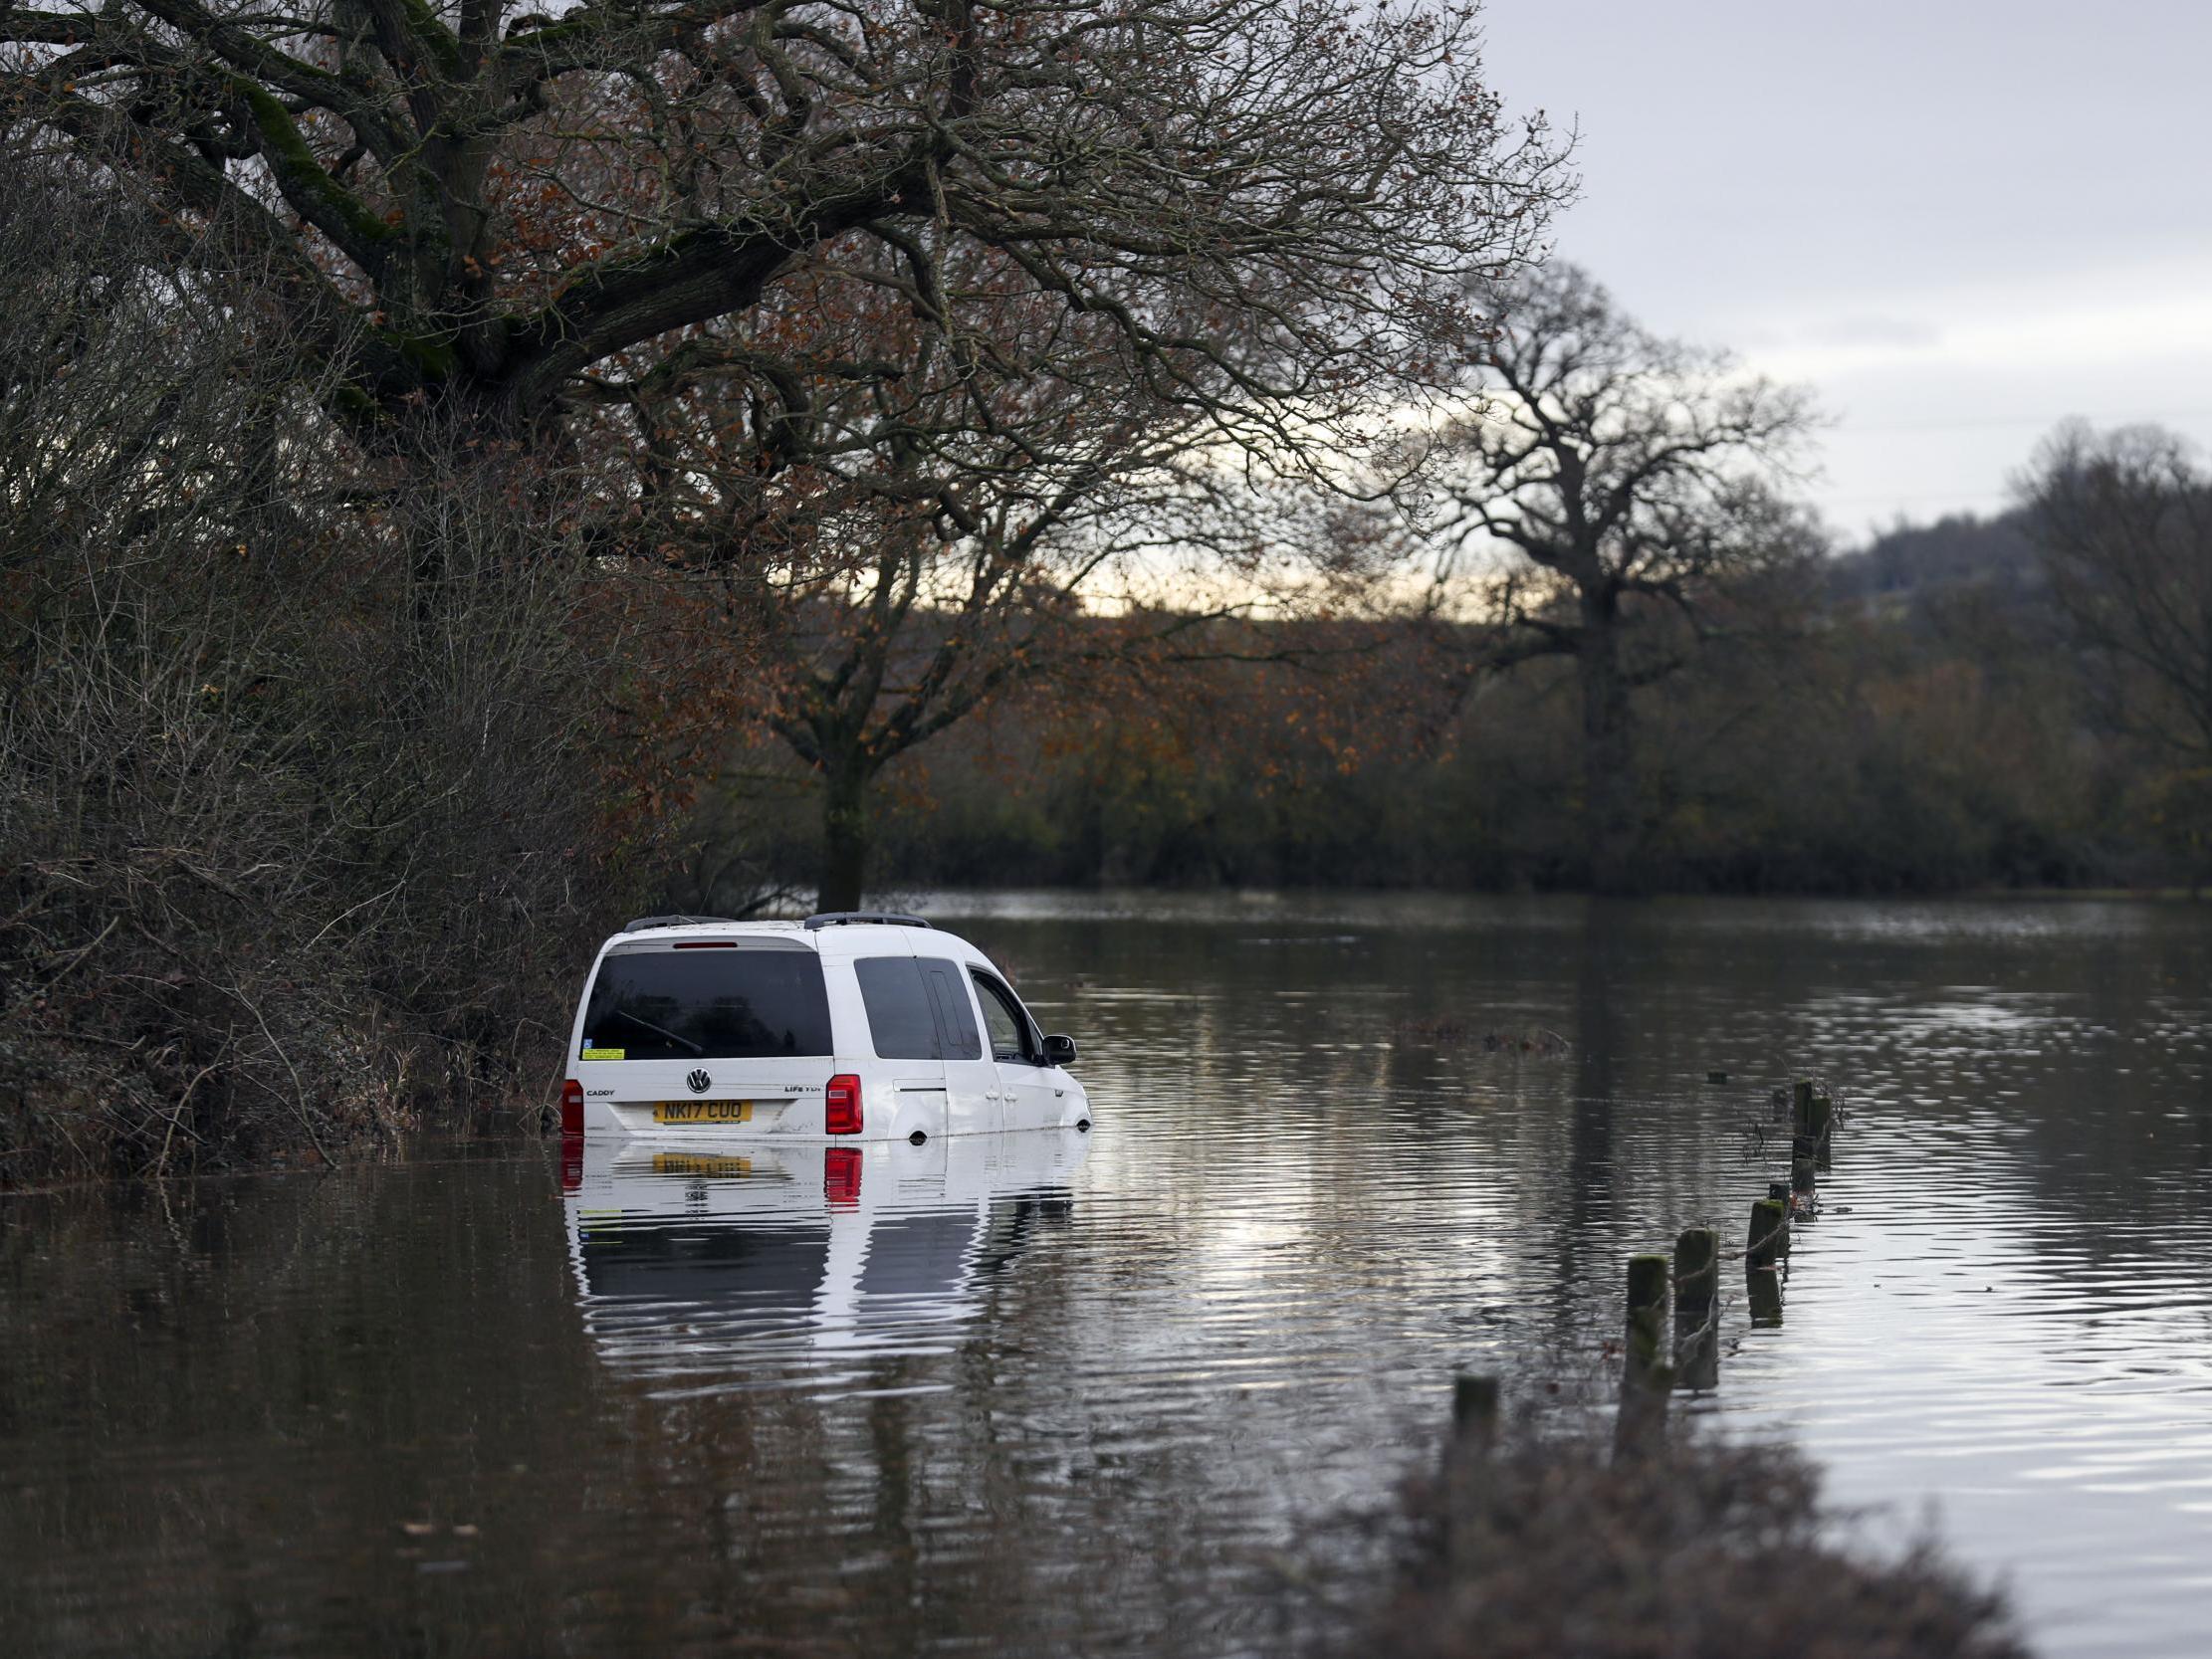 UK weather: Flood warnings issued as Storm Atiyah bears down on Britain